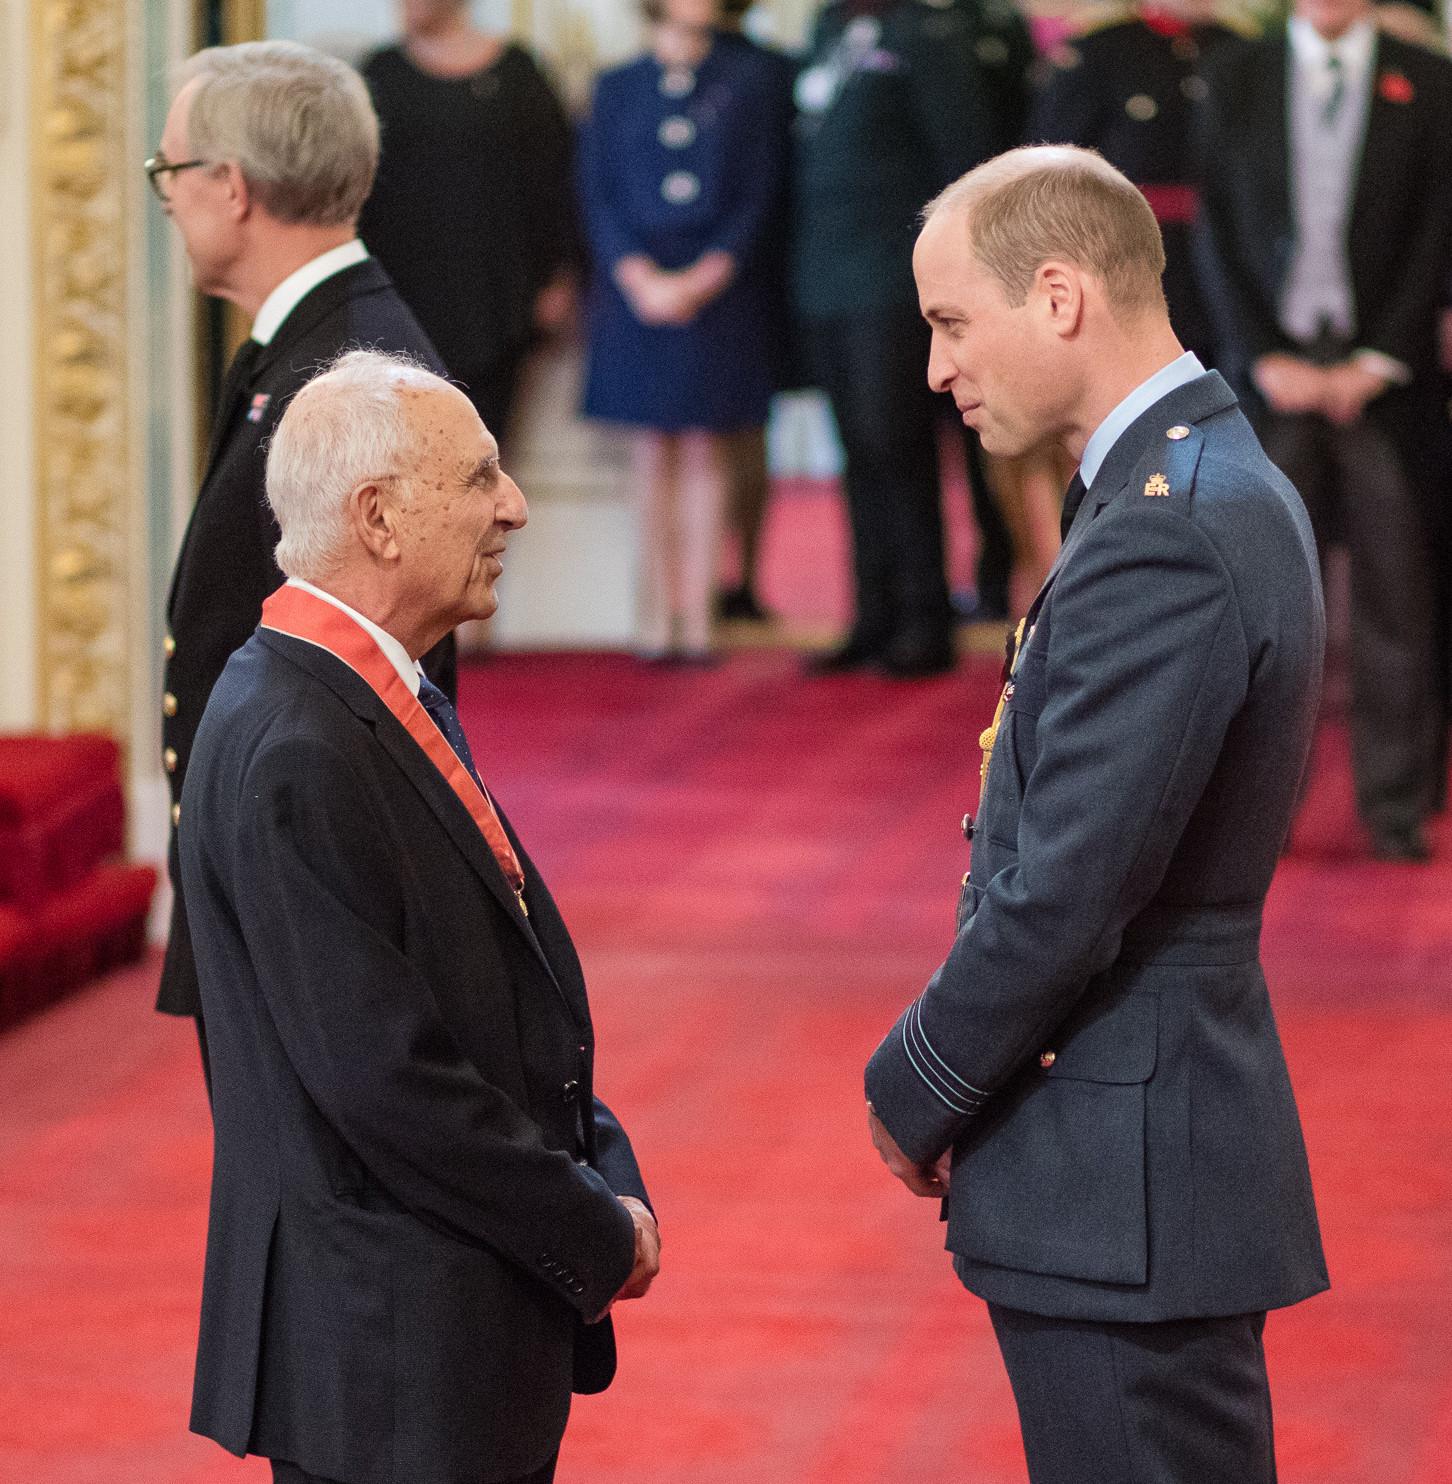 Prof. Haro Bedelian and Prince William